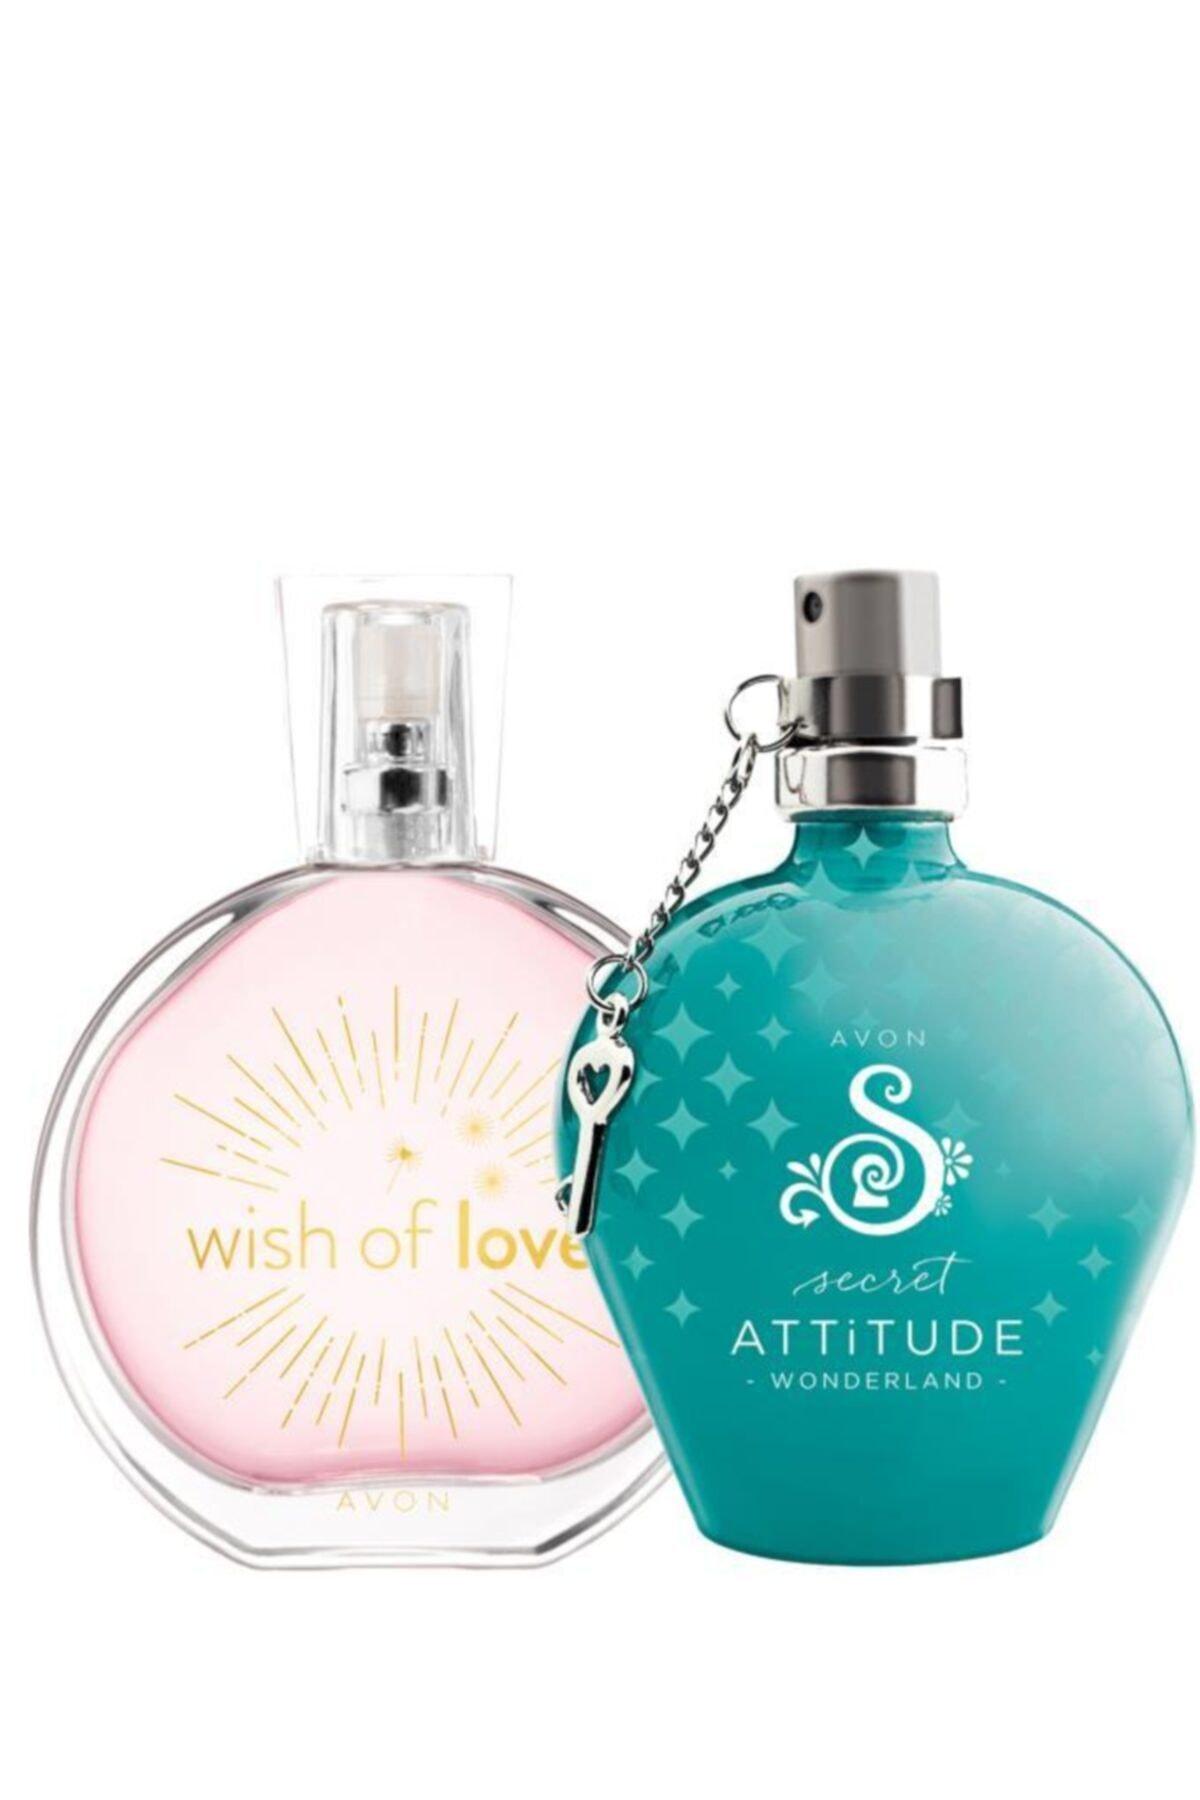 AVON Wish Of Love Ve Secret Attitude Wonderland Edt 50 ml Kadın Parfüm Paketi 5055550006199 1